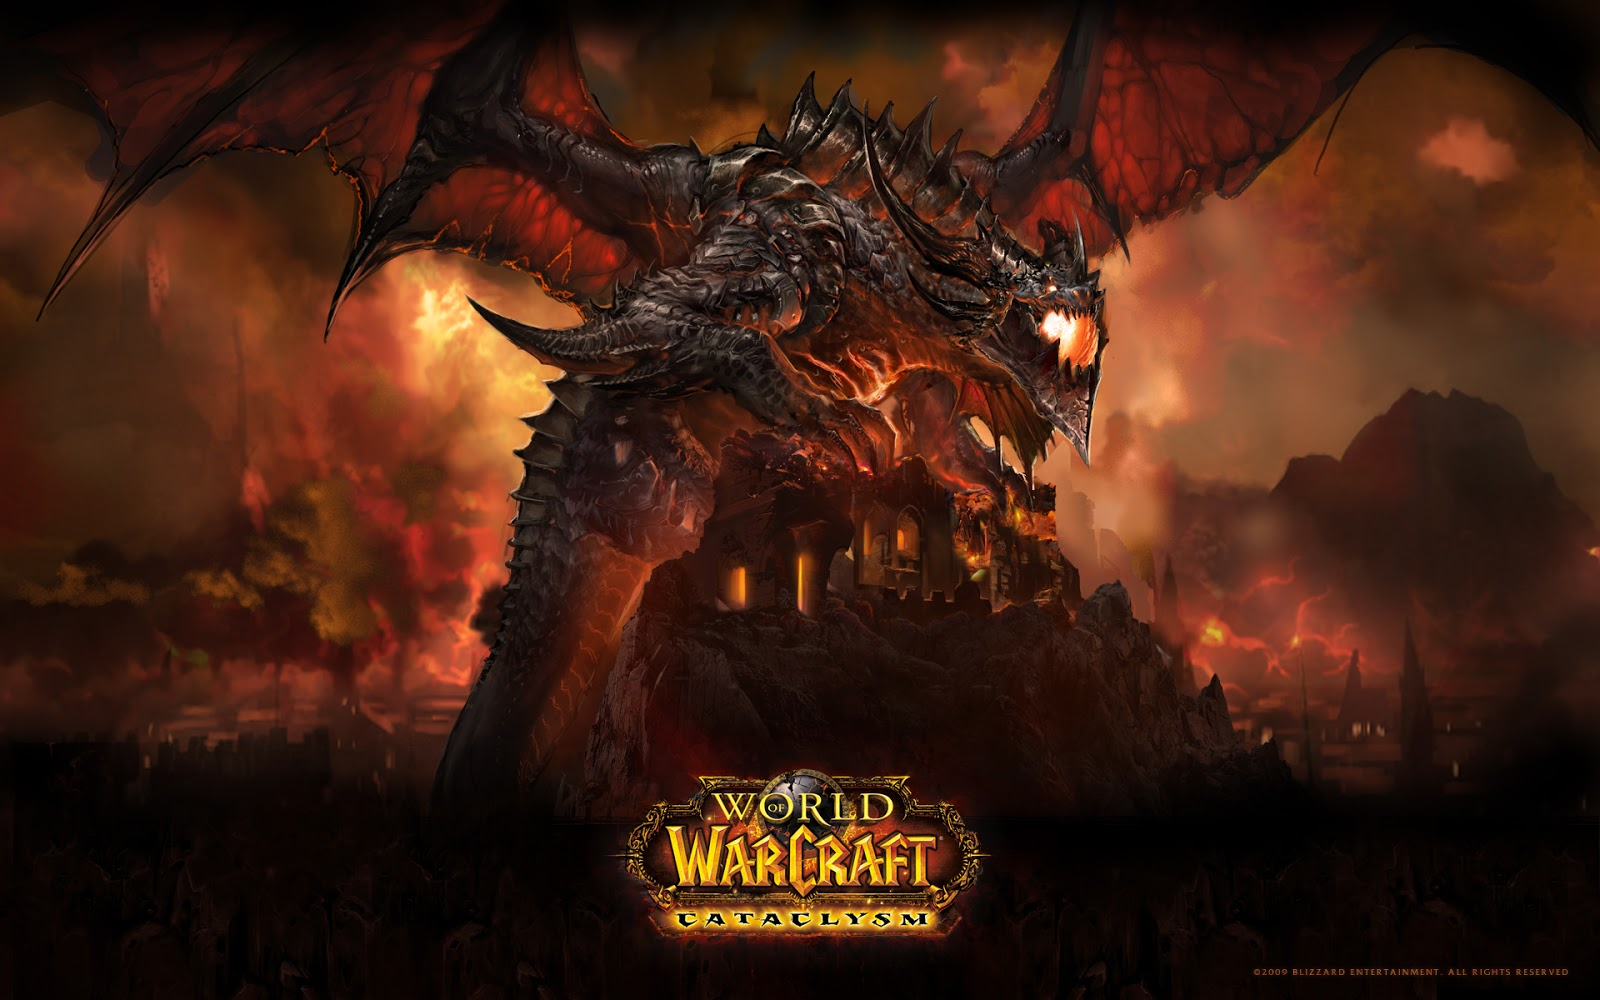 World Of Warcraft Wallpaper Cataclysm  Apps Directories